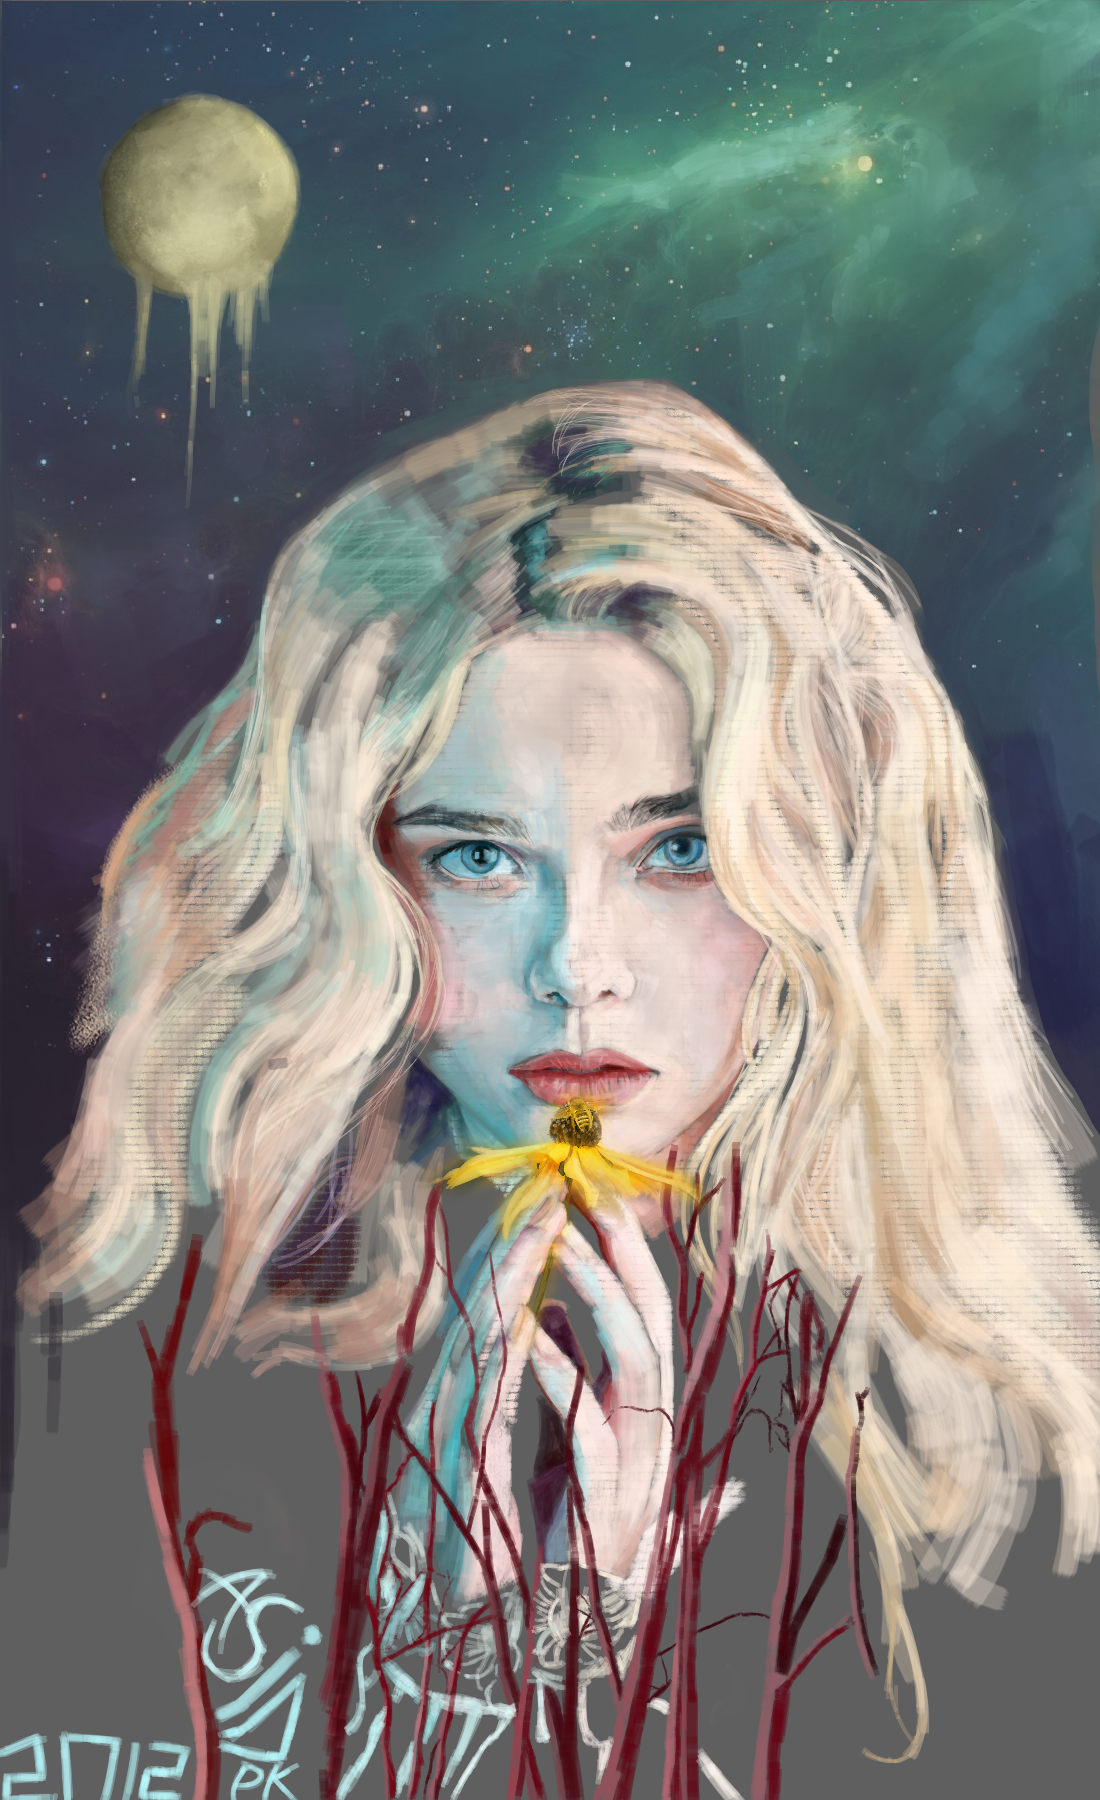 Moonchild by Asidpk